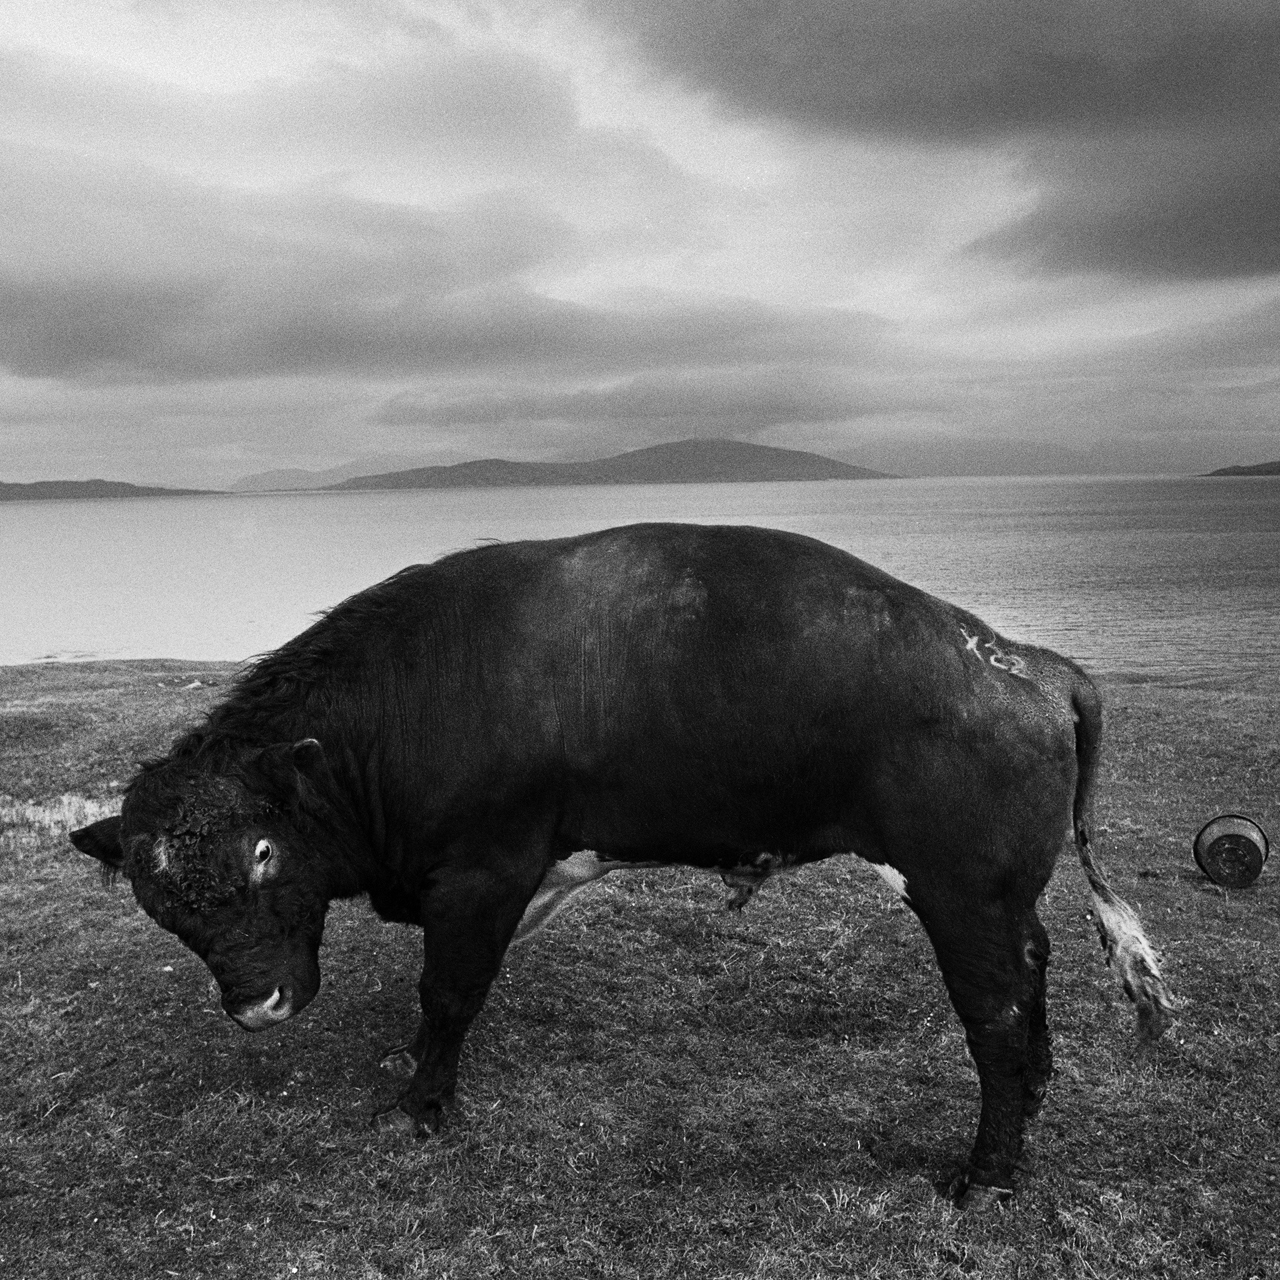 Image of The Scarista Bull, Isle of Harris (1979) by Oscar Marzaroli